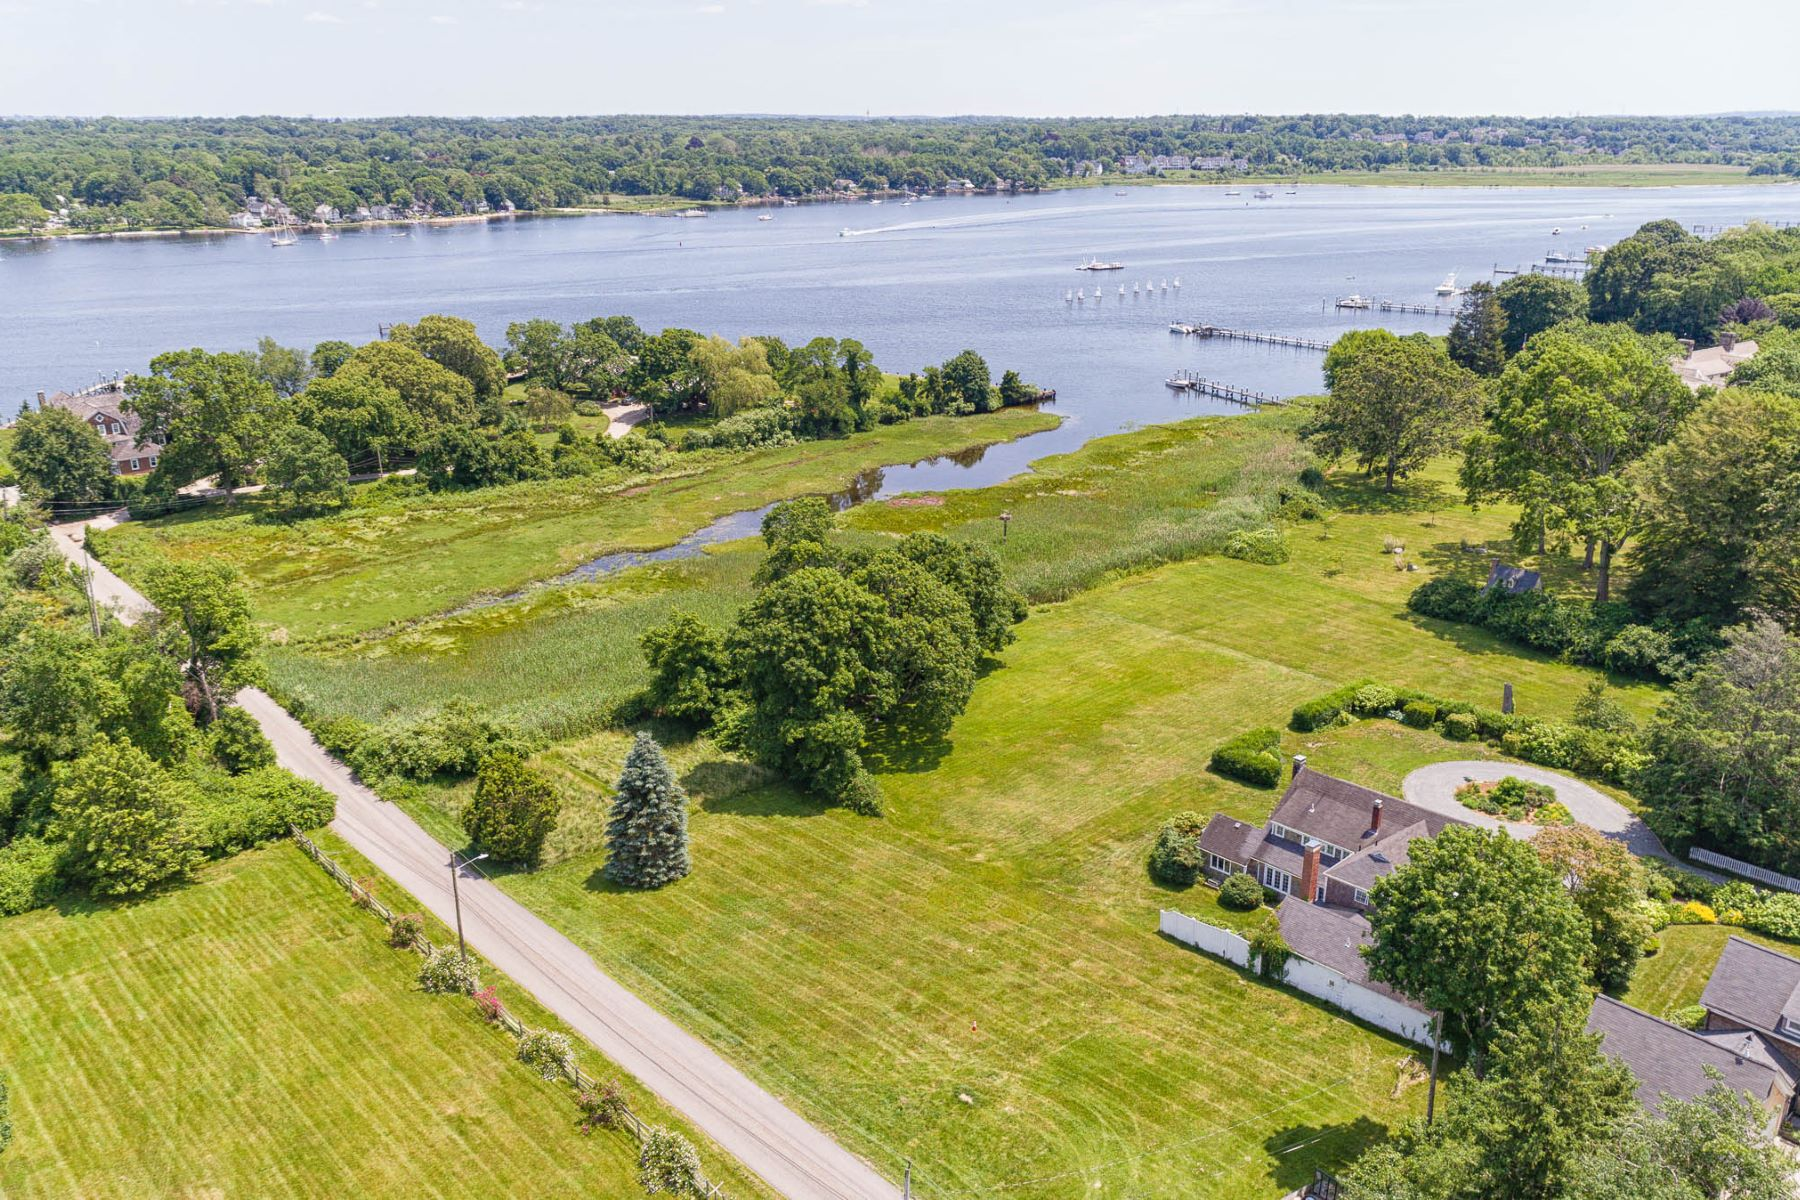 Land for Sale at 7 Bourne Ln., Barrington, RI 7 Bourne Ln. Barrington, Rhode Island 02806 United States